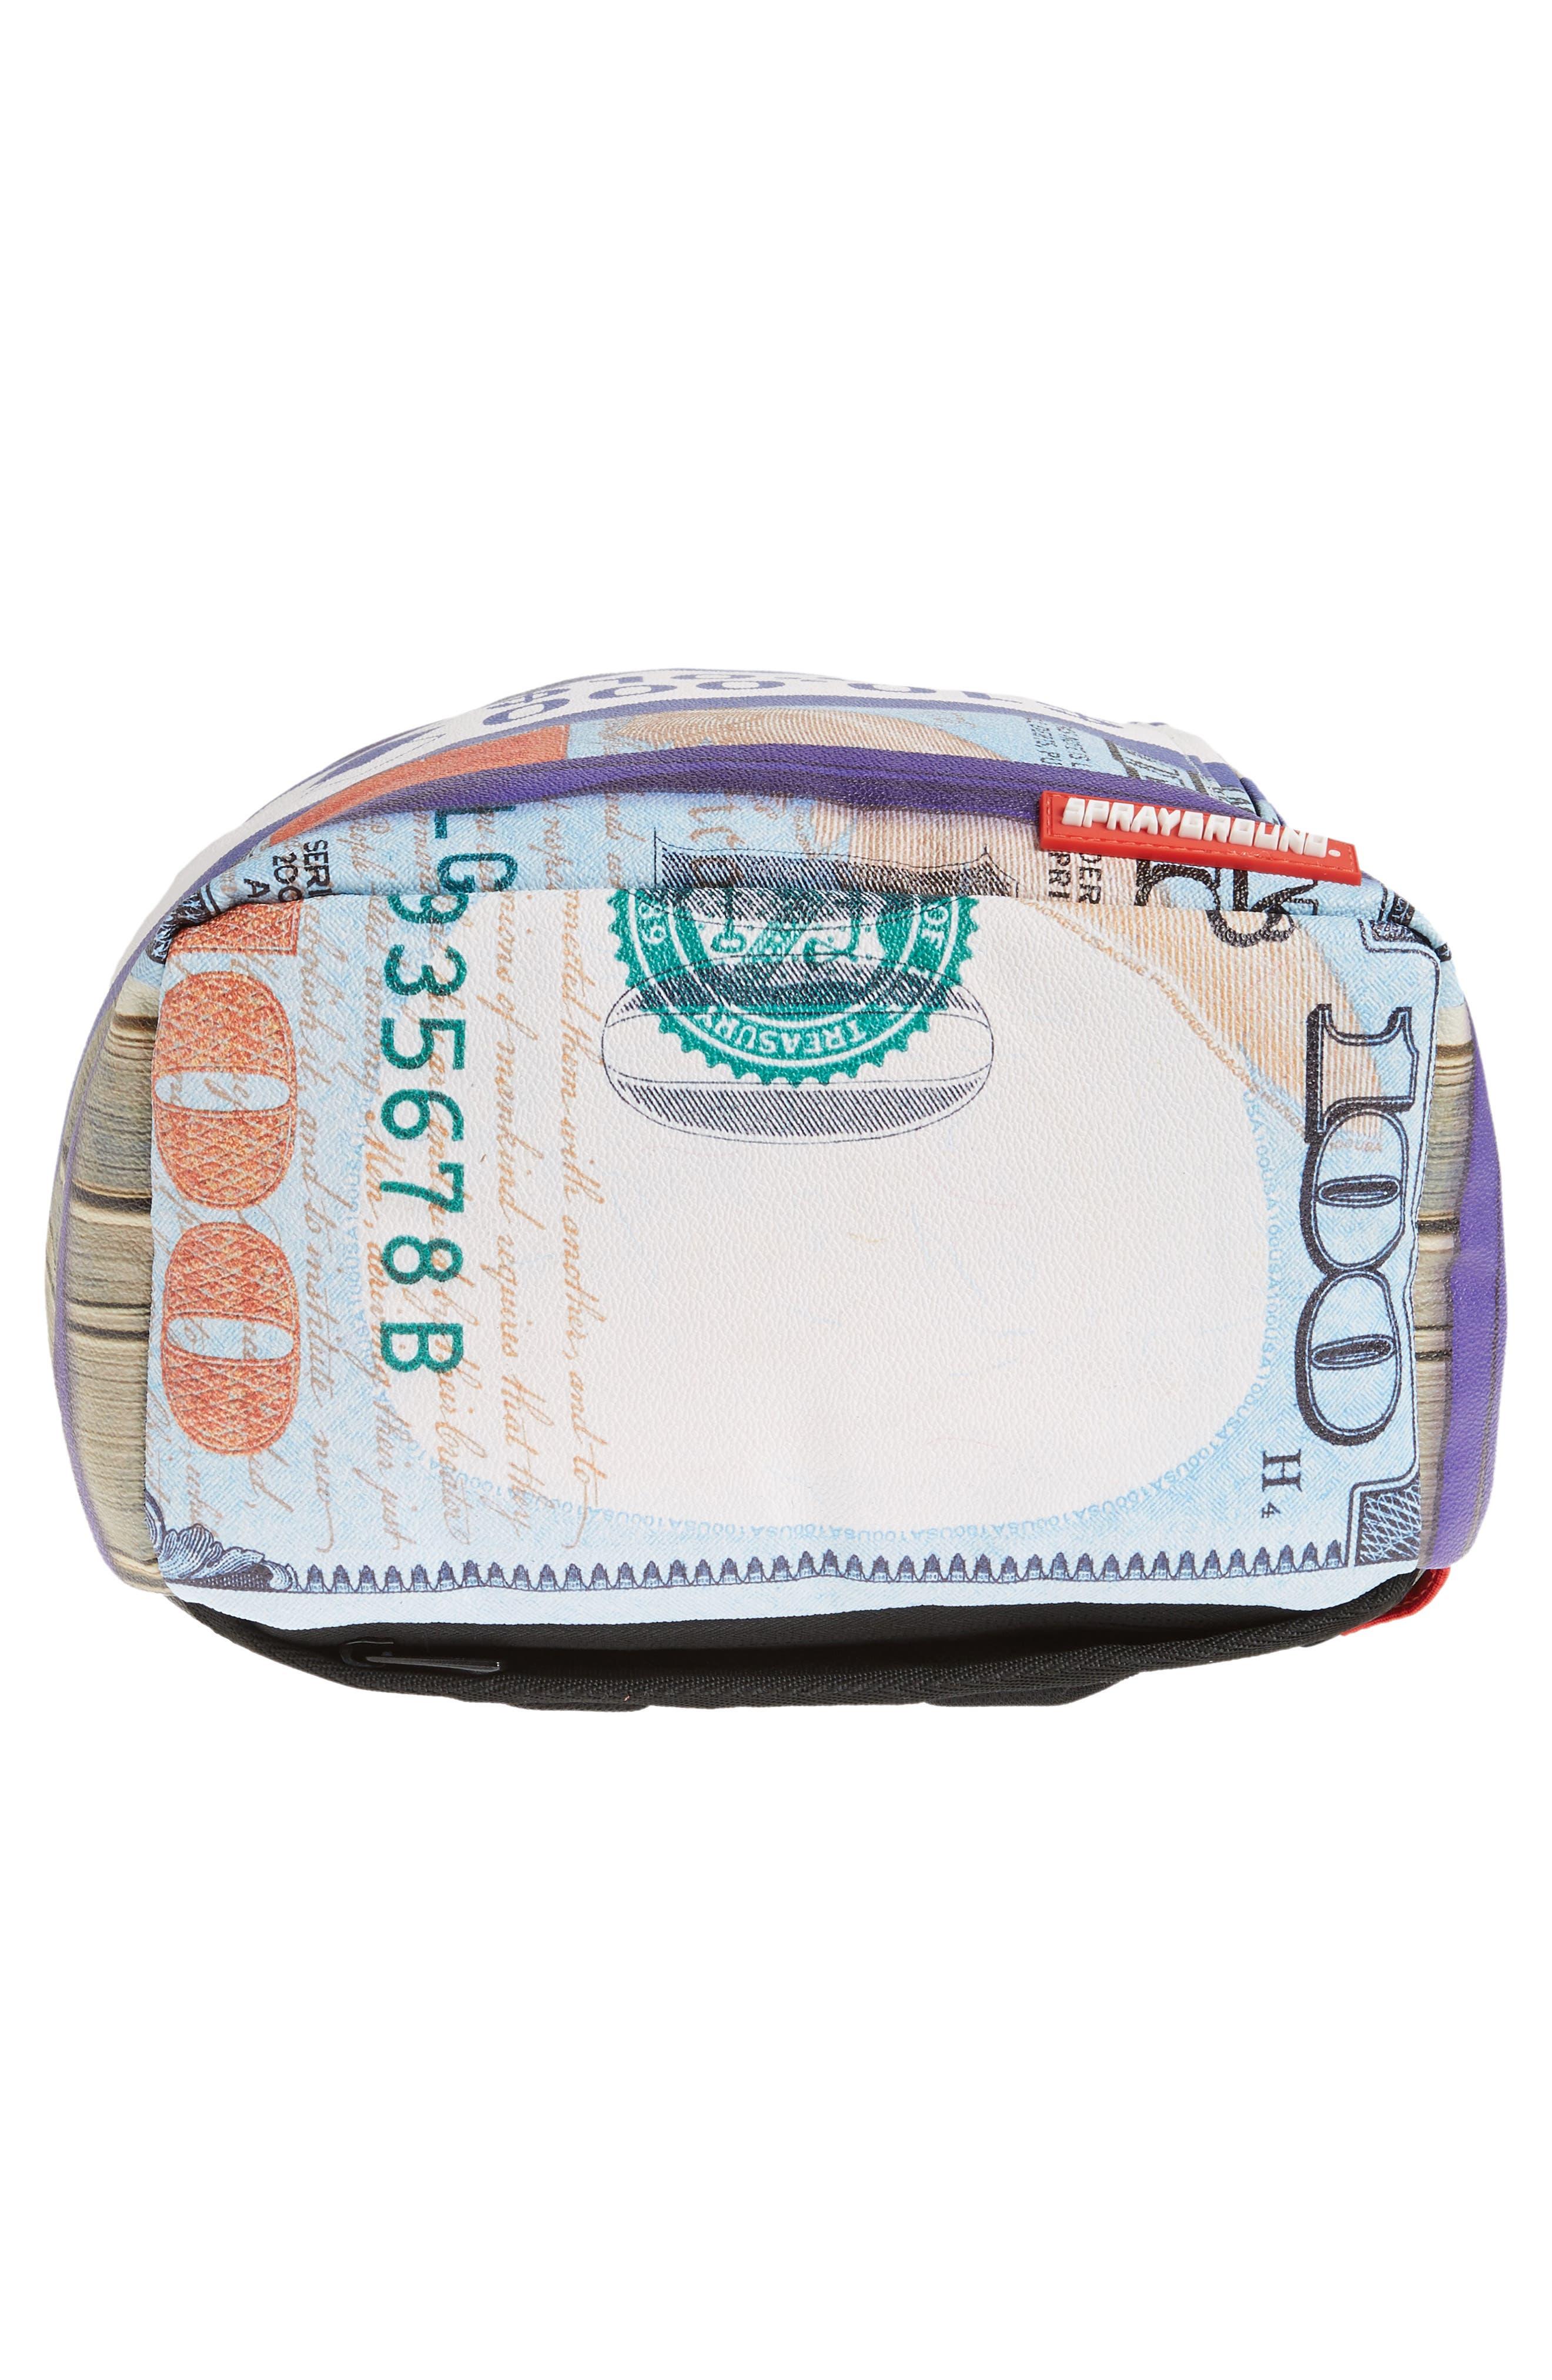 Purple Money Stacks Backpack,                             Alternate thumbnail 6, color,                             500